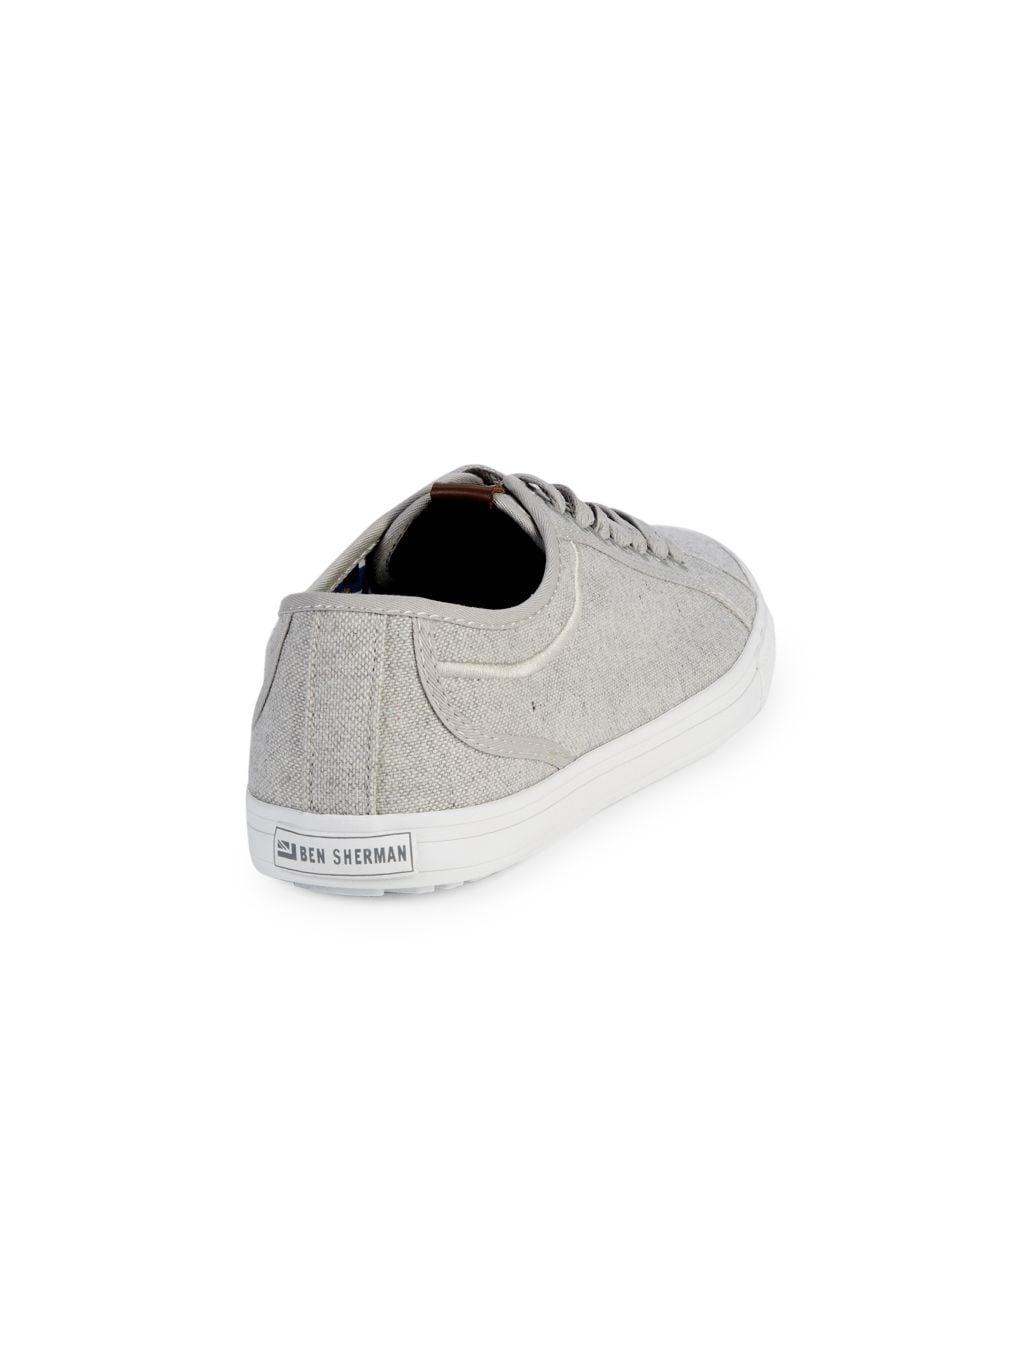 Ben Sherman Conall Canvas Sneakers